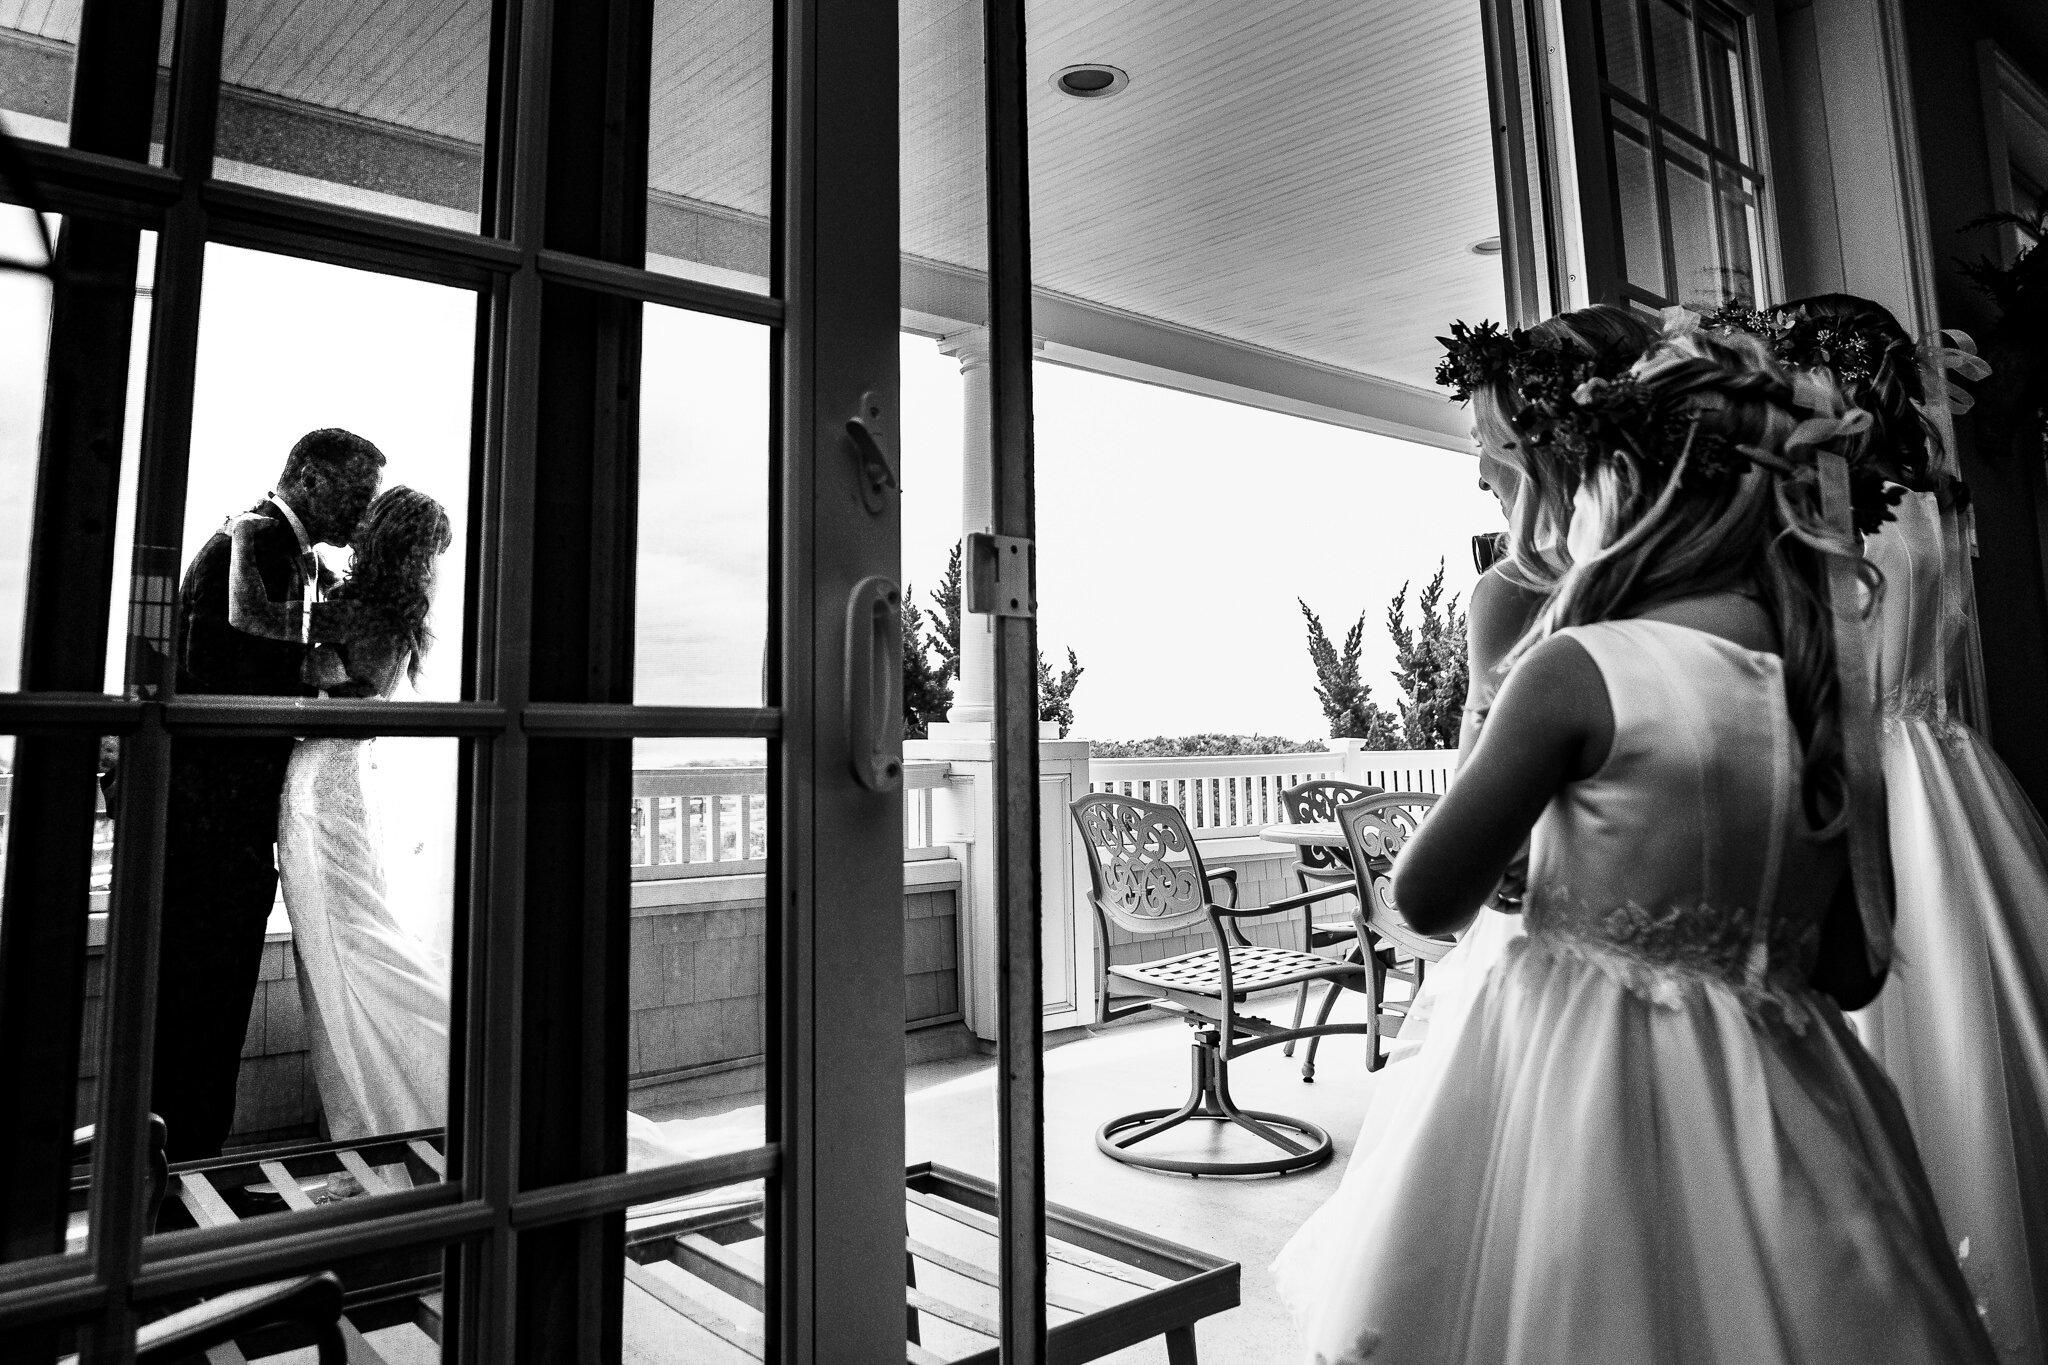 Snell-Ocean-City-Yacht-Club-New-Jersey-Wedding-Photographer-07.JPG